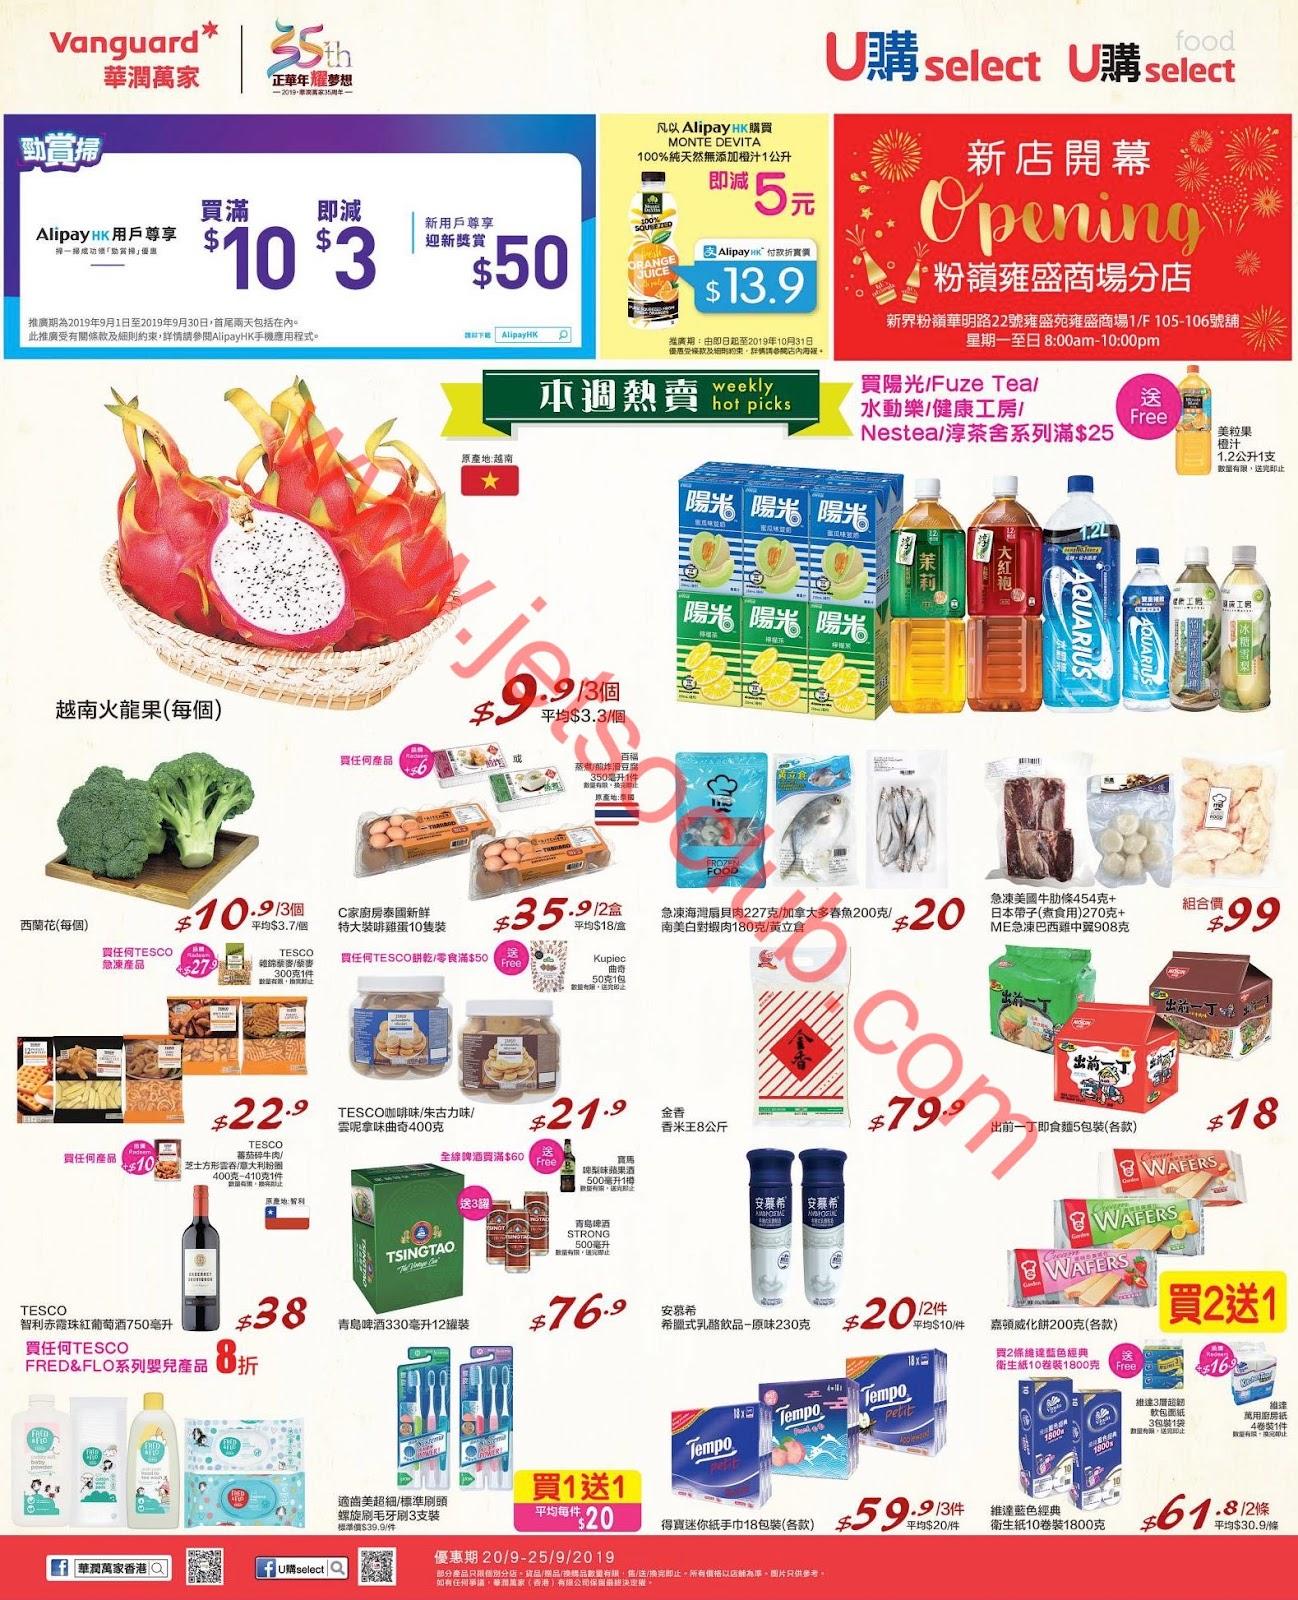 U購 select / 華潤萬家超級市場最新優惠(20/9) ( Jetso Club 著數俱樂部 )